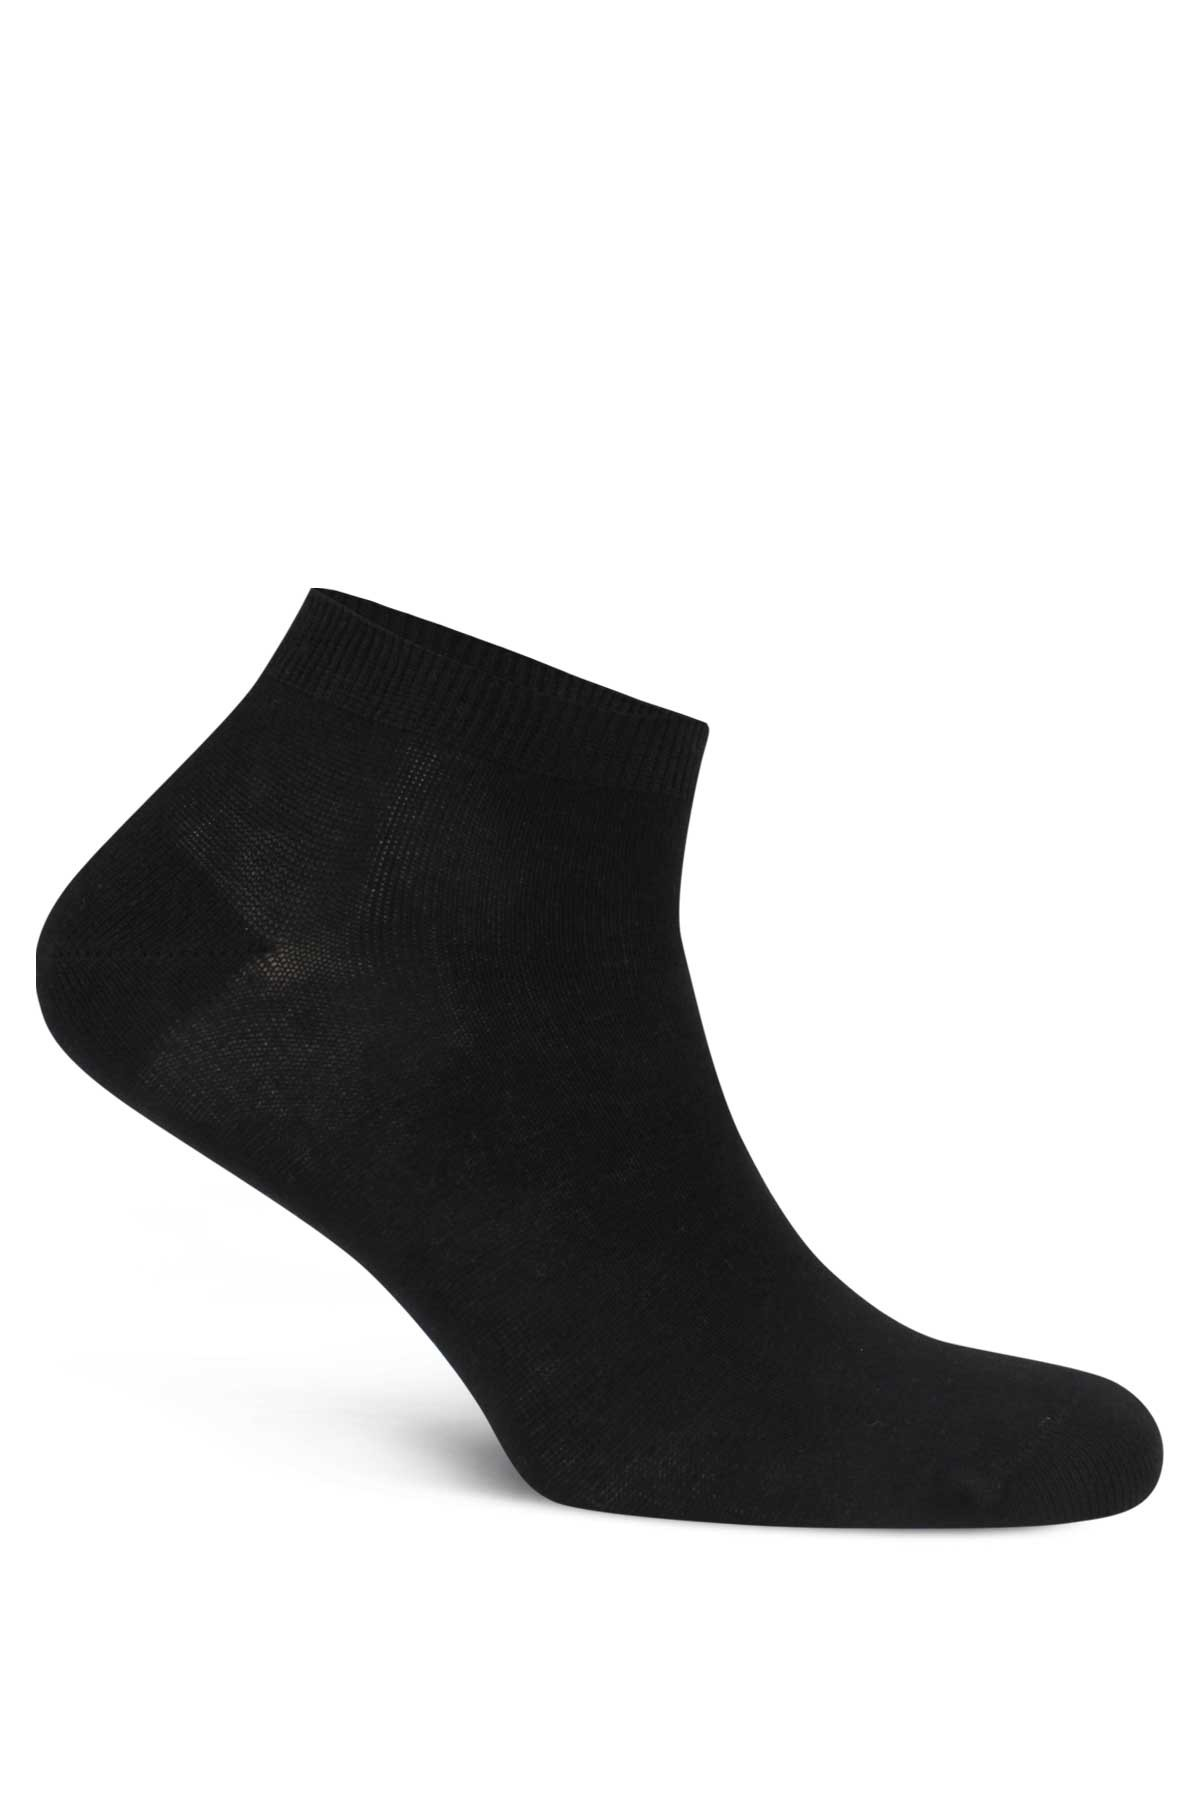 Aytuğ Kabartmalı Komet Patik Erkek Çorap - Thumbnail